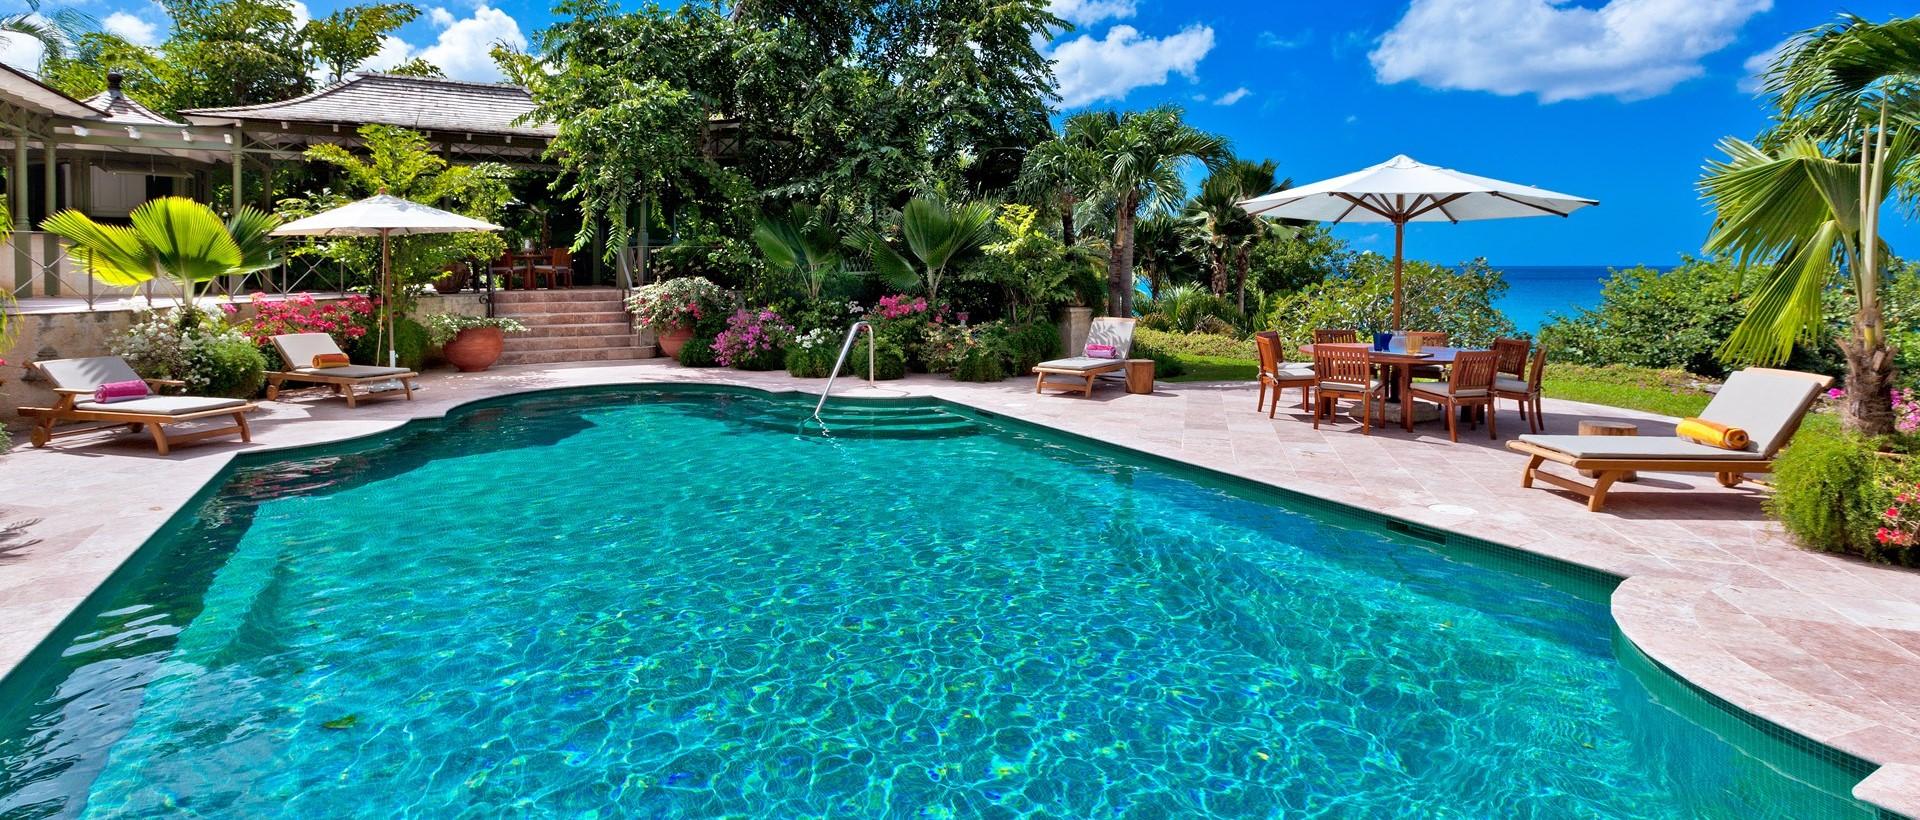 villa-gardenia-barbados-swimming-pool